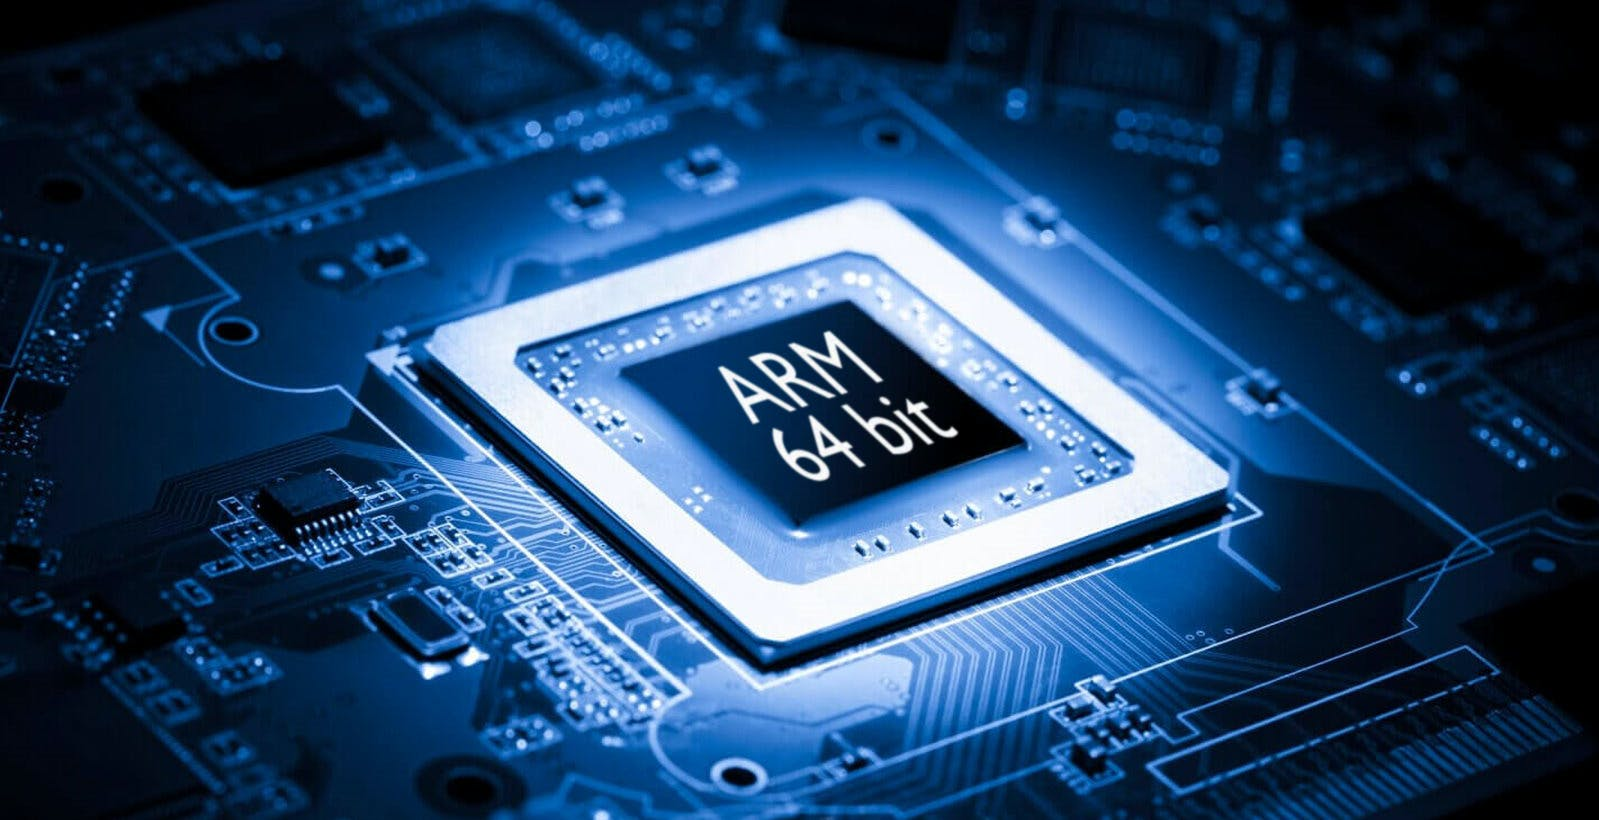 Le CPU Cortex-A di Arm abbandoneranno per sempre i 32 bit a partire dal 2022